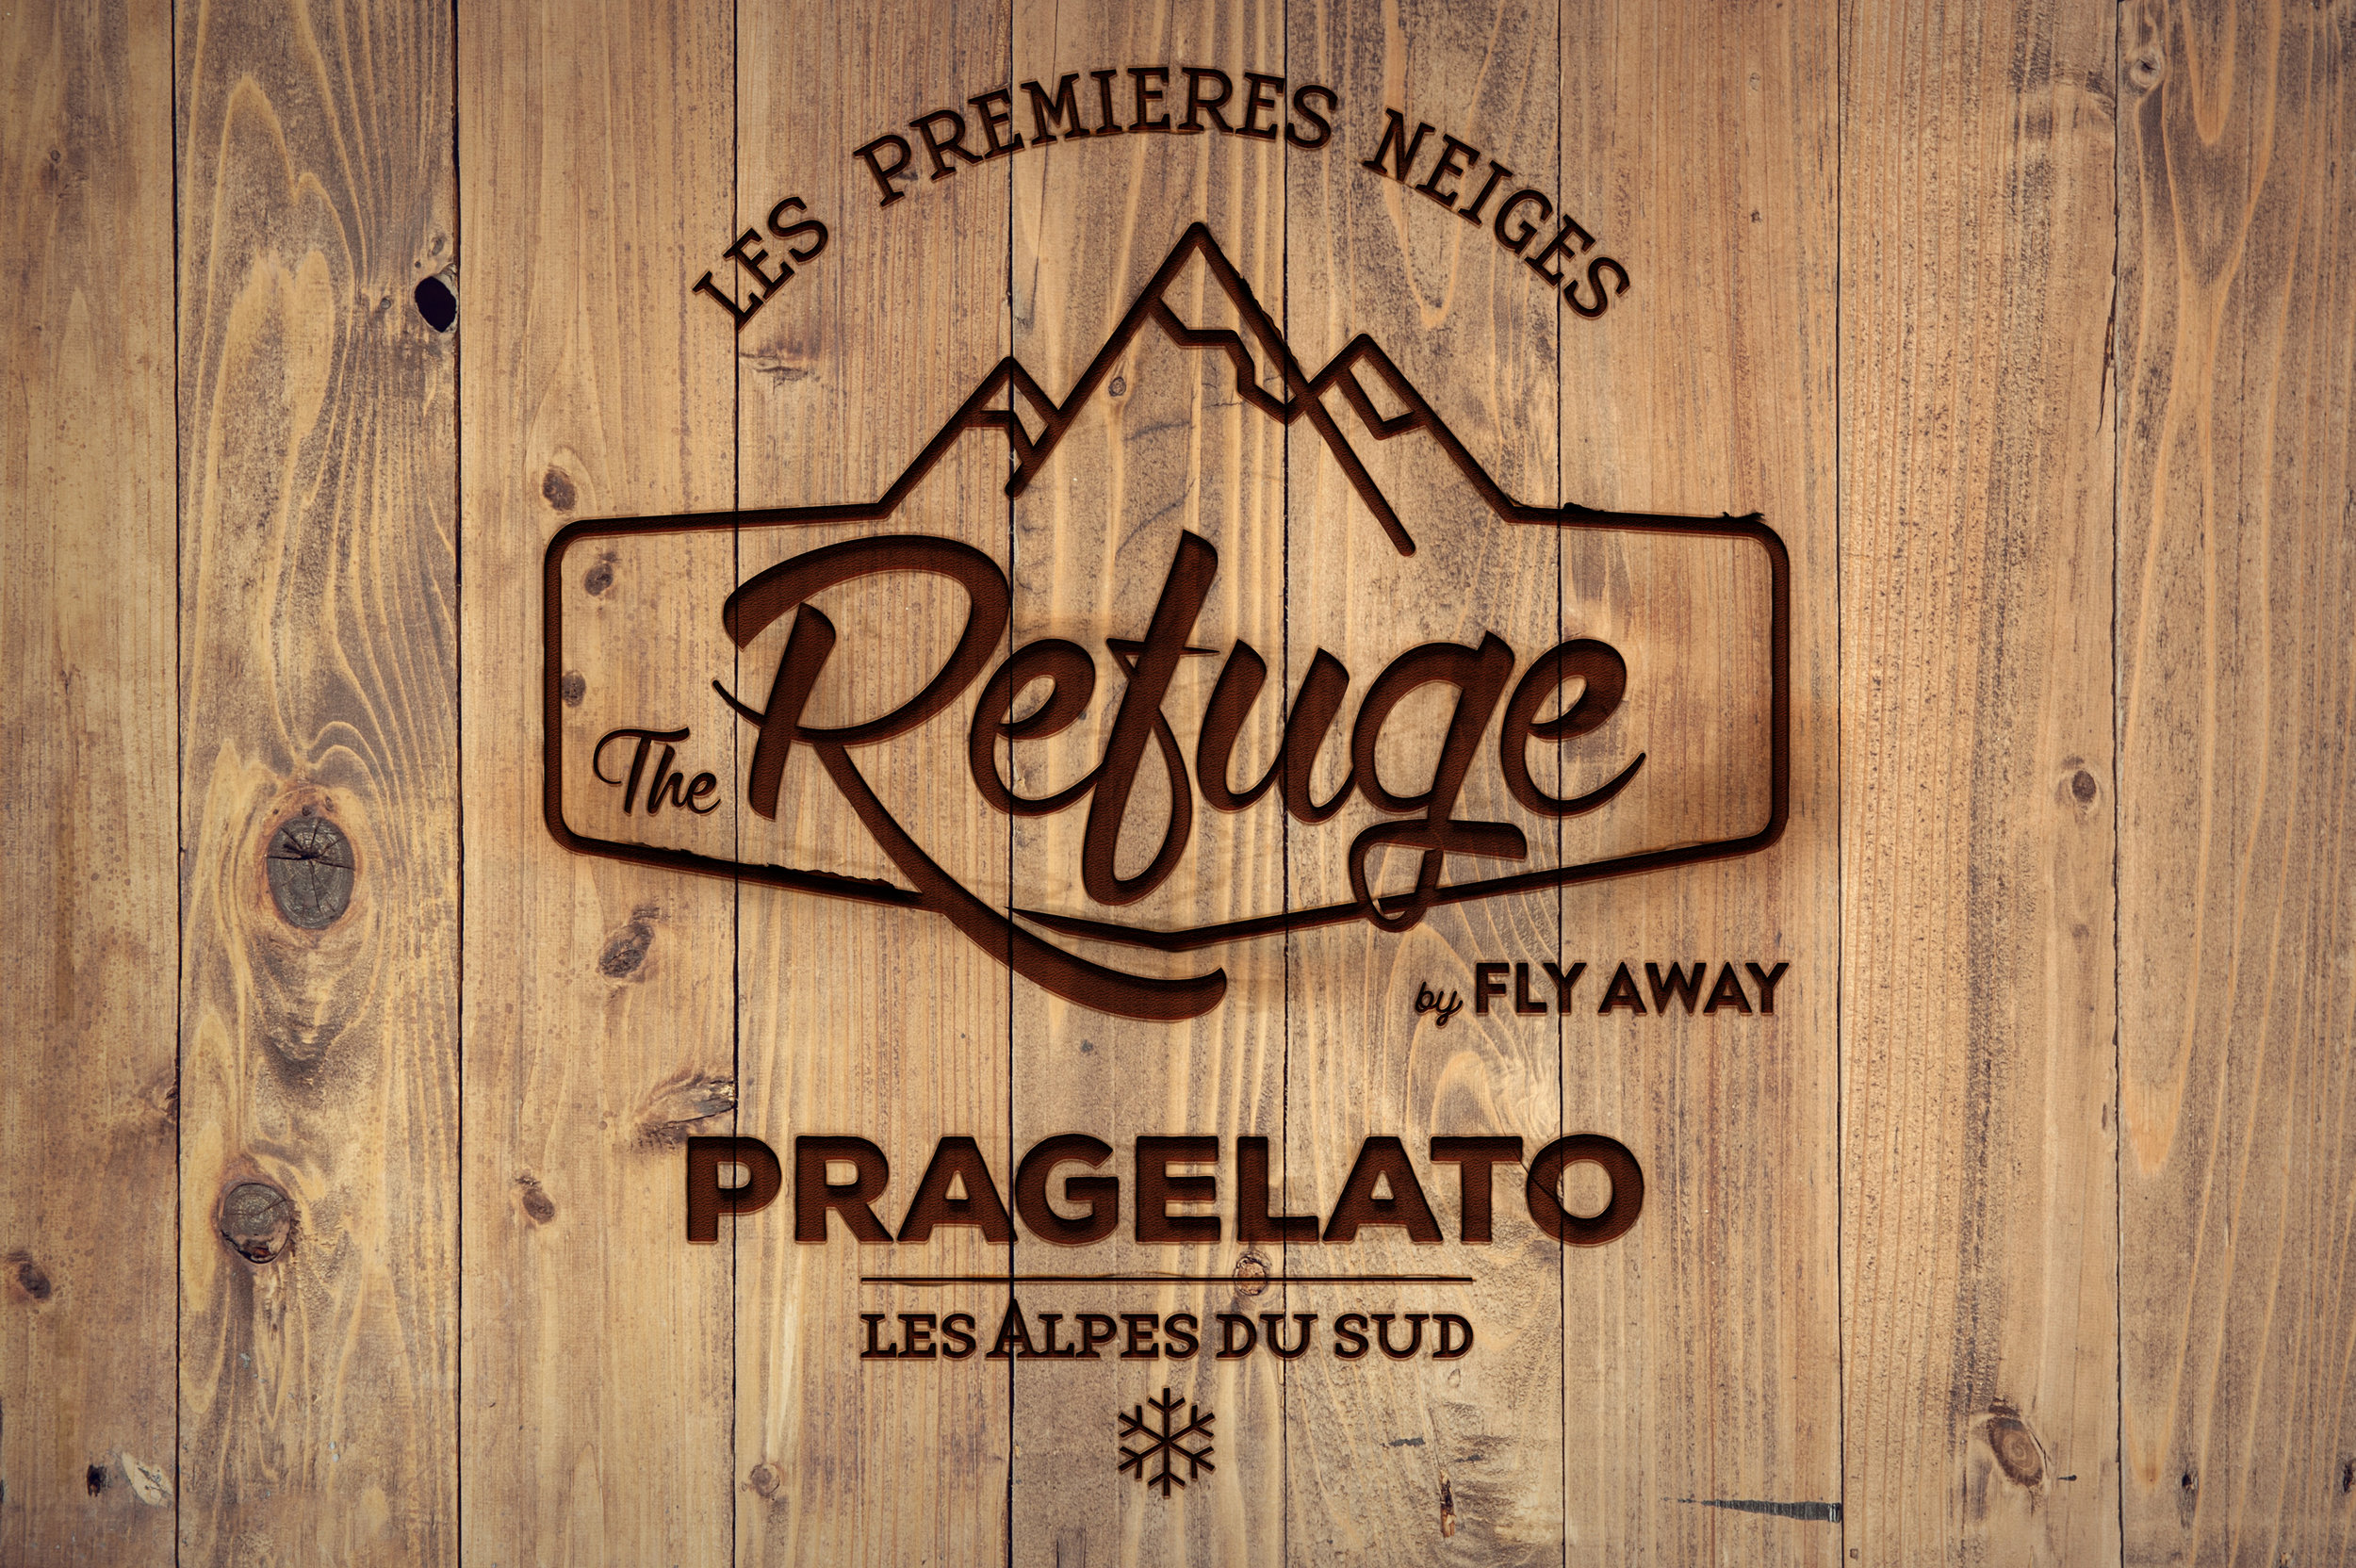 RFG-Pragelato-logo-wood.jpg